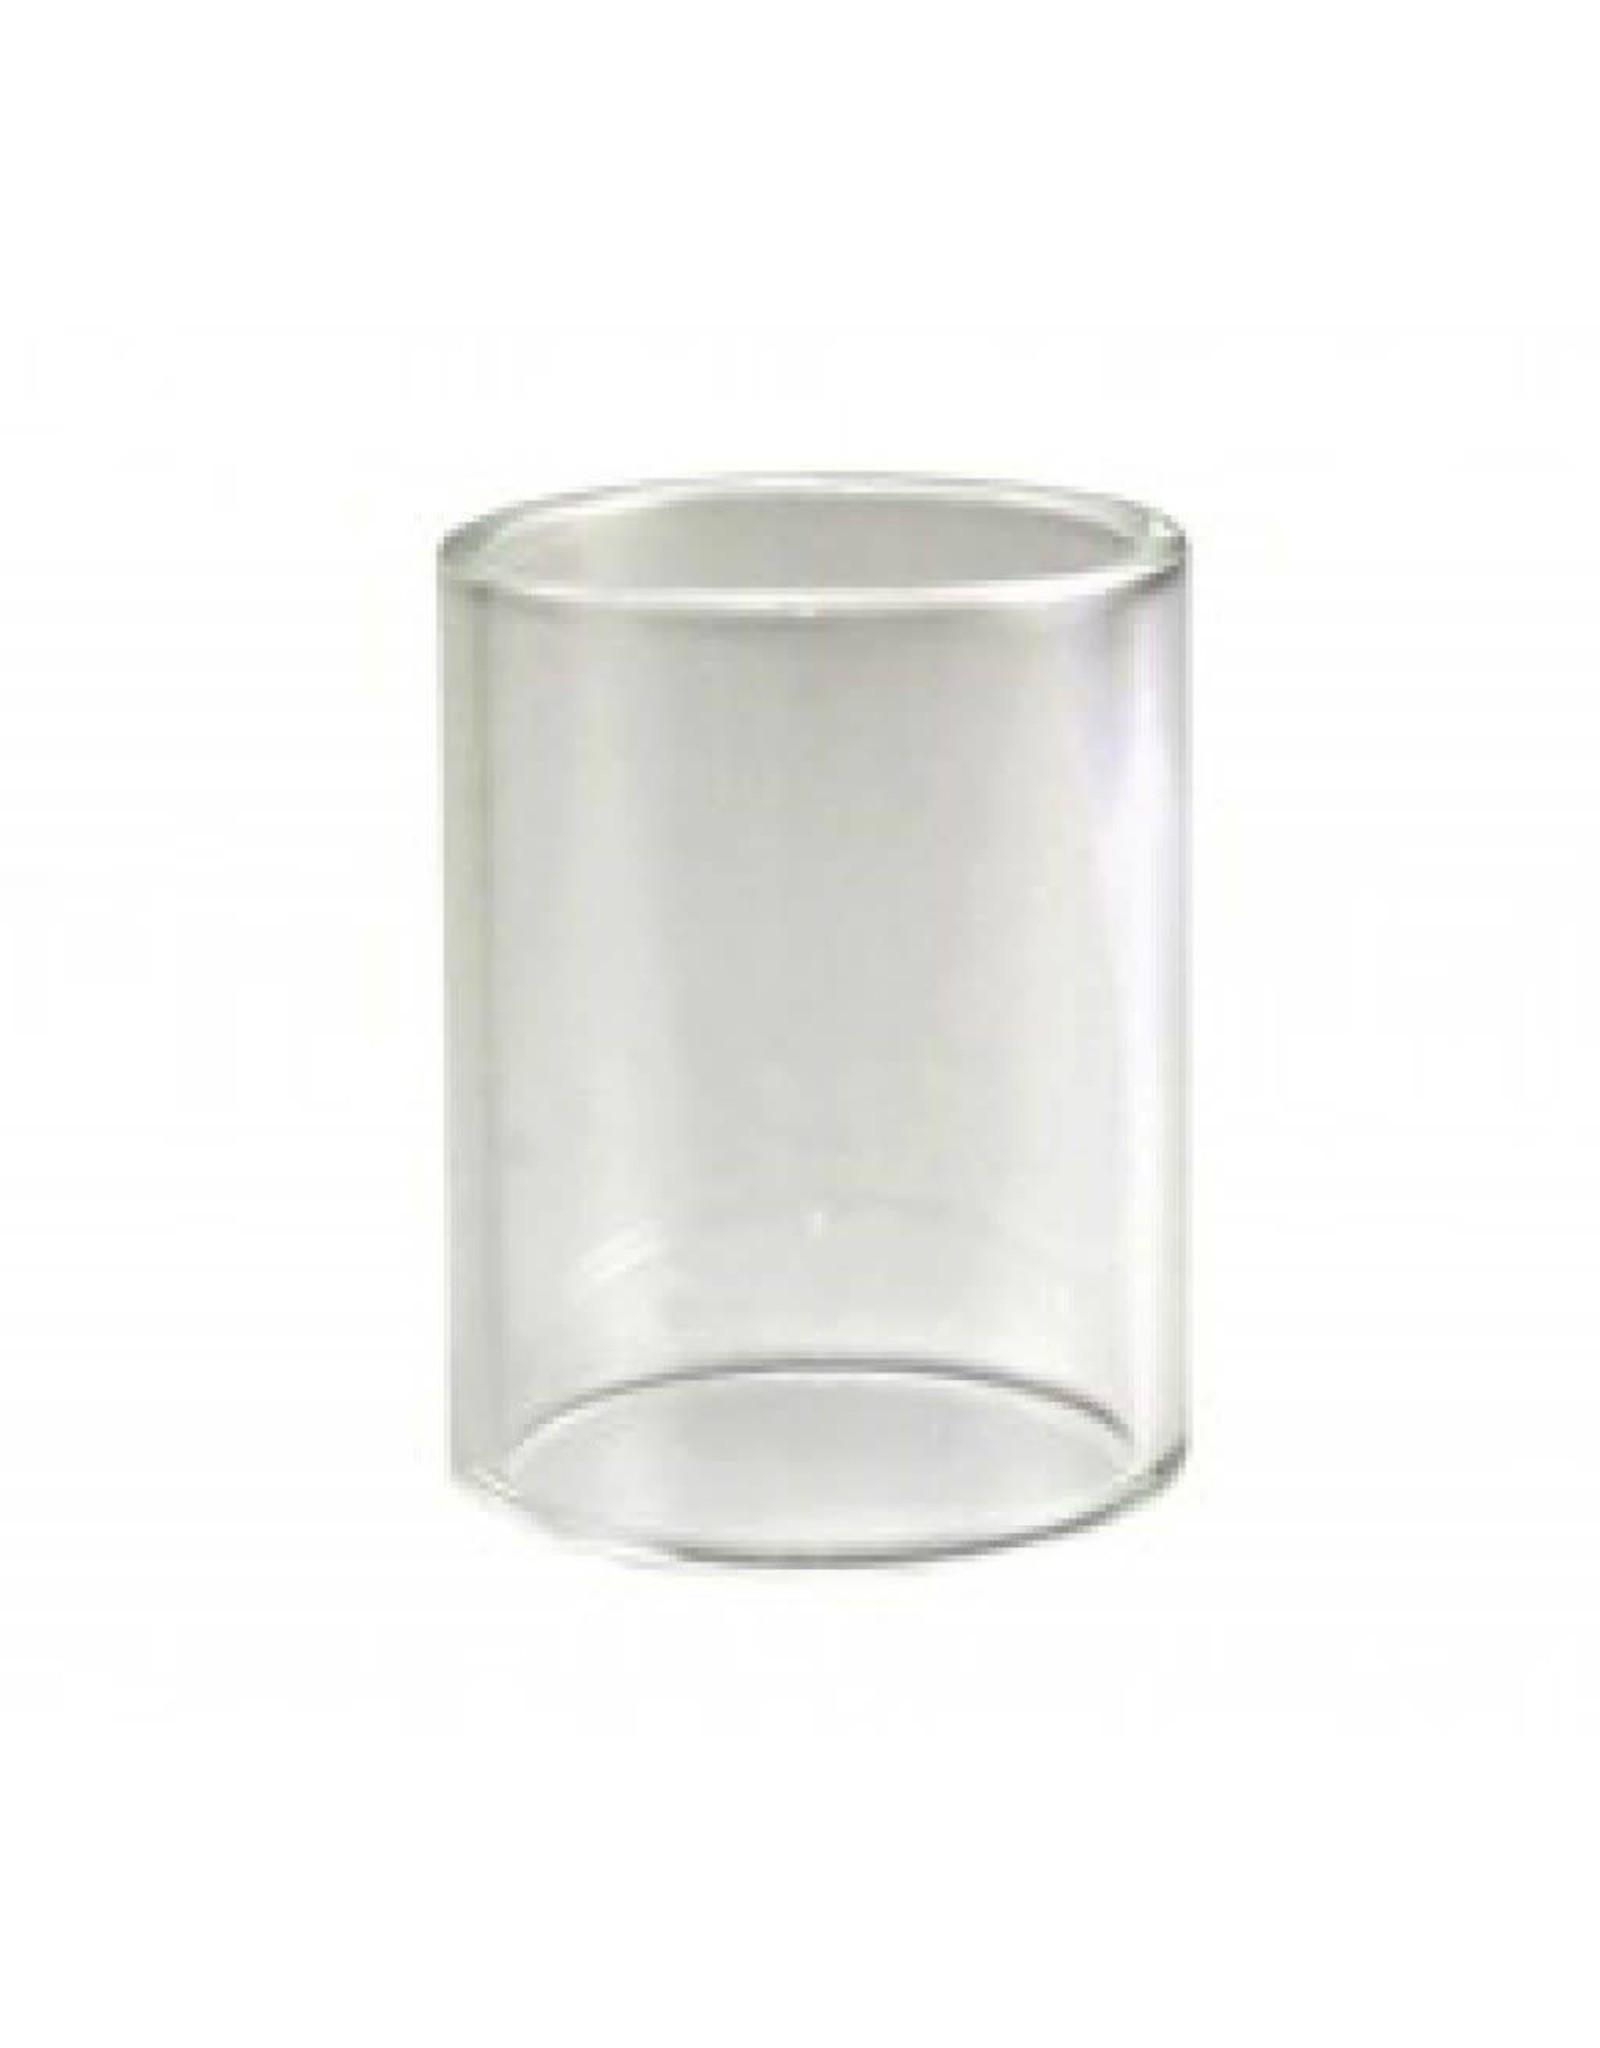 Aspire Replacement Glass Aspire PRO Tank